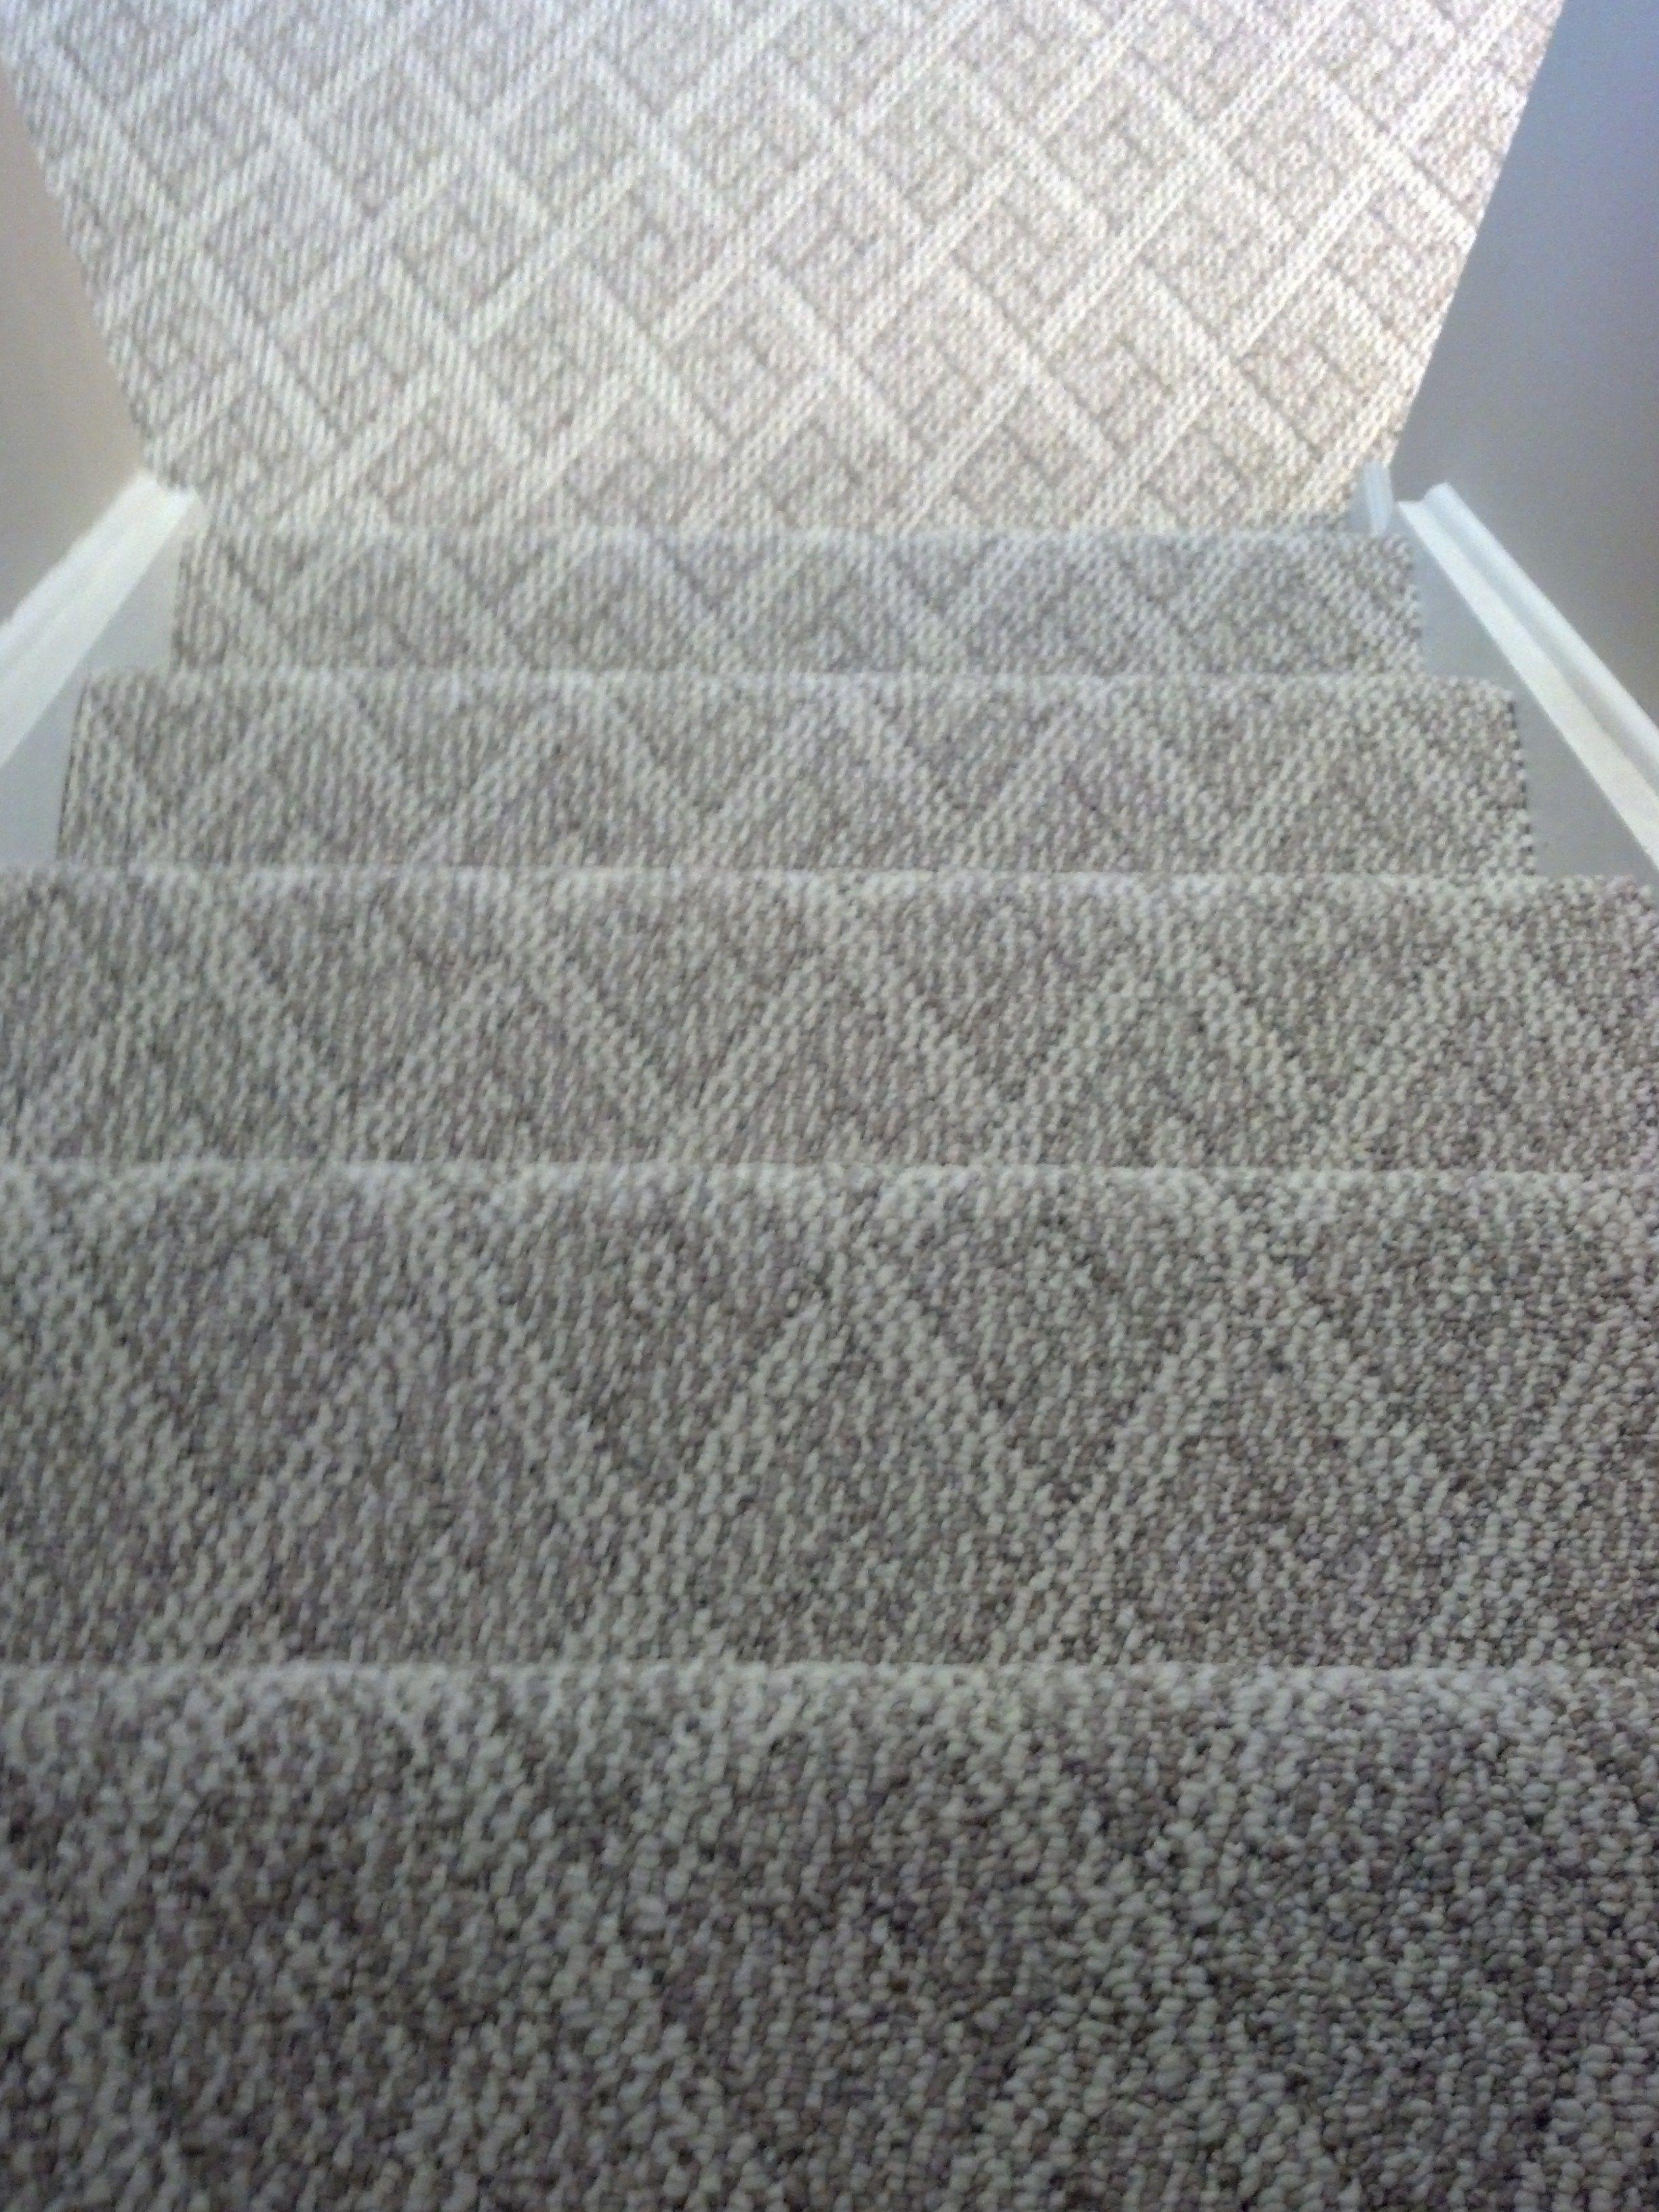 berber carpeting berber carpet cincinnati, ohio installed on steps and basement family room.  note.....notice EOAUCHT